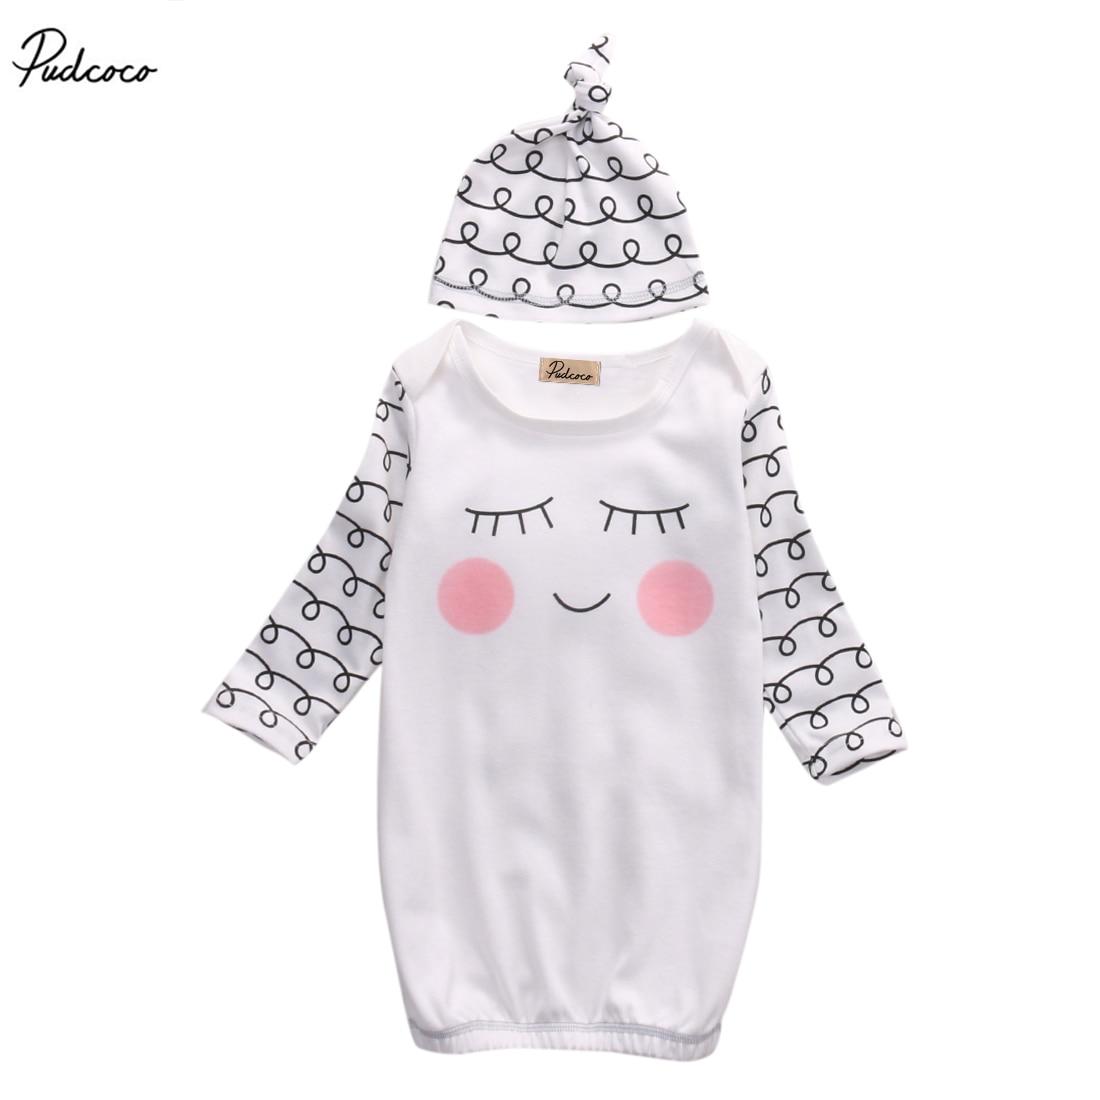 Tweet Twoo Heart Printed Pajama Sets 6 24 Months Baby Girls Clothing